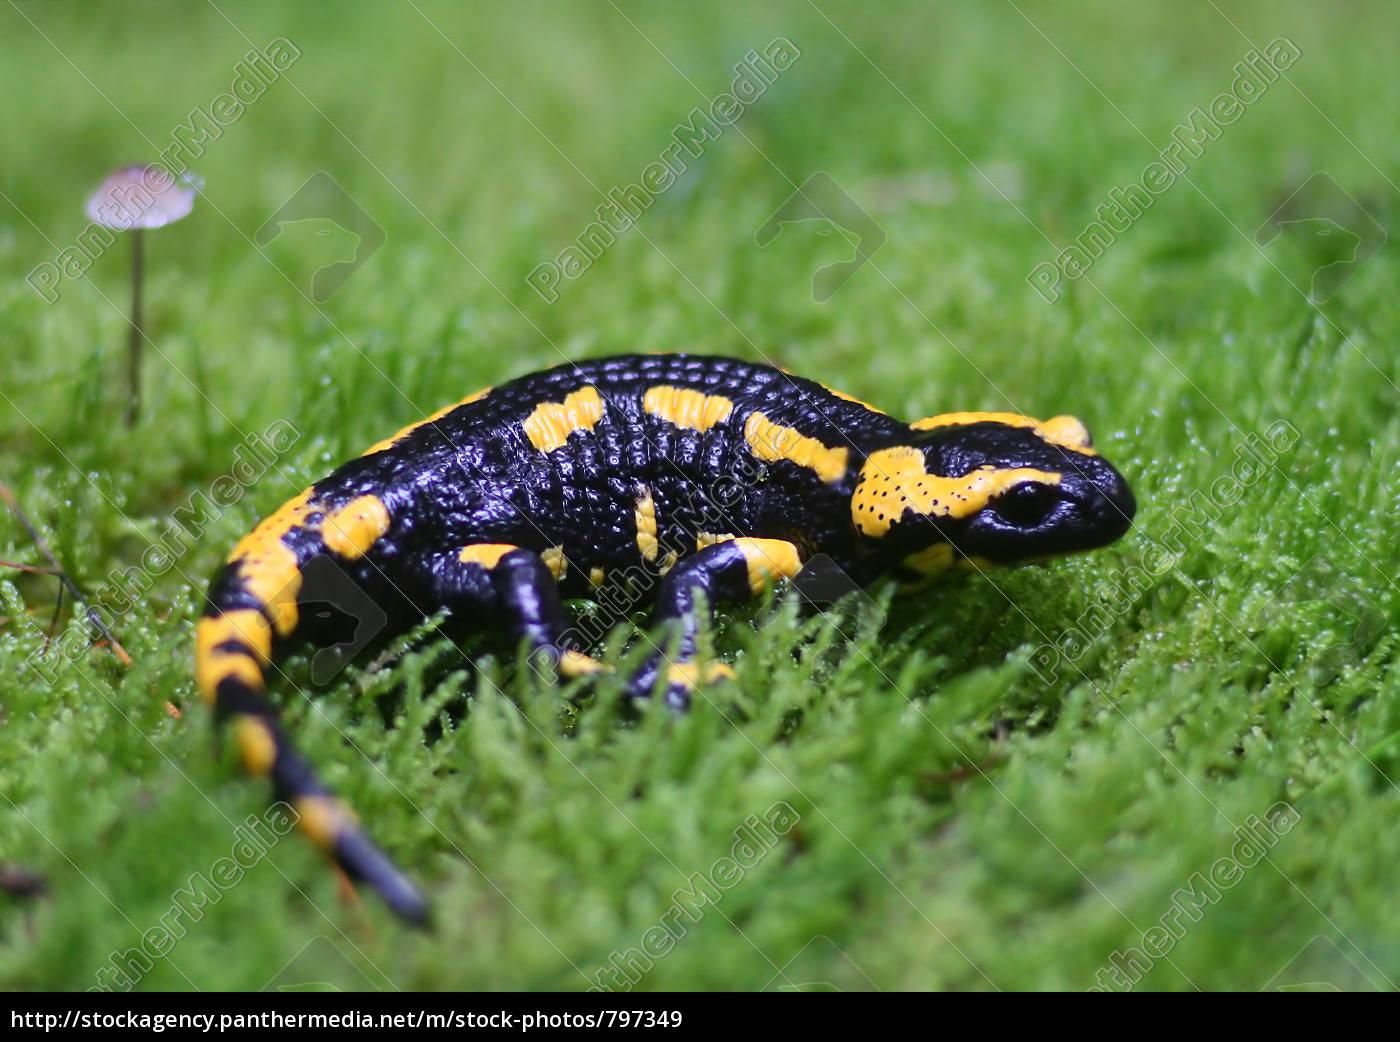 fire, salamander - 797349